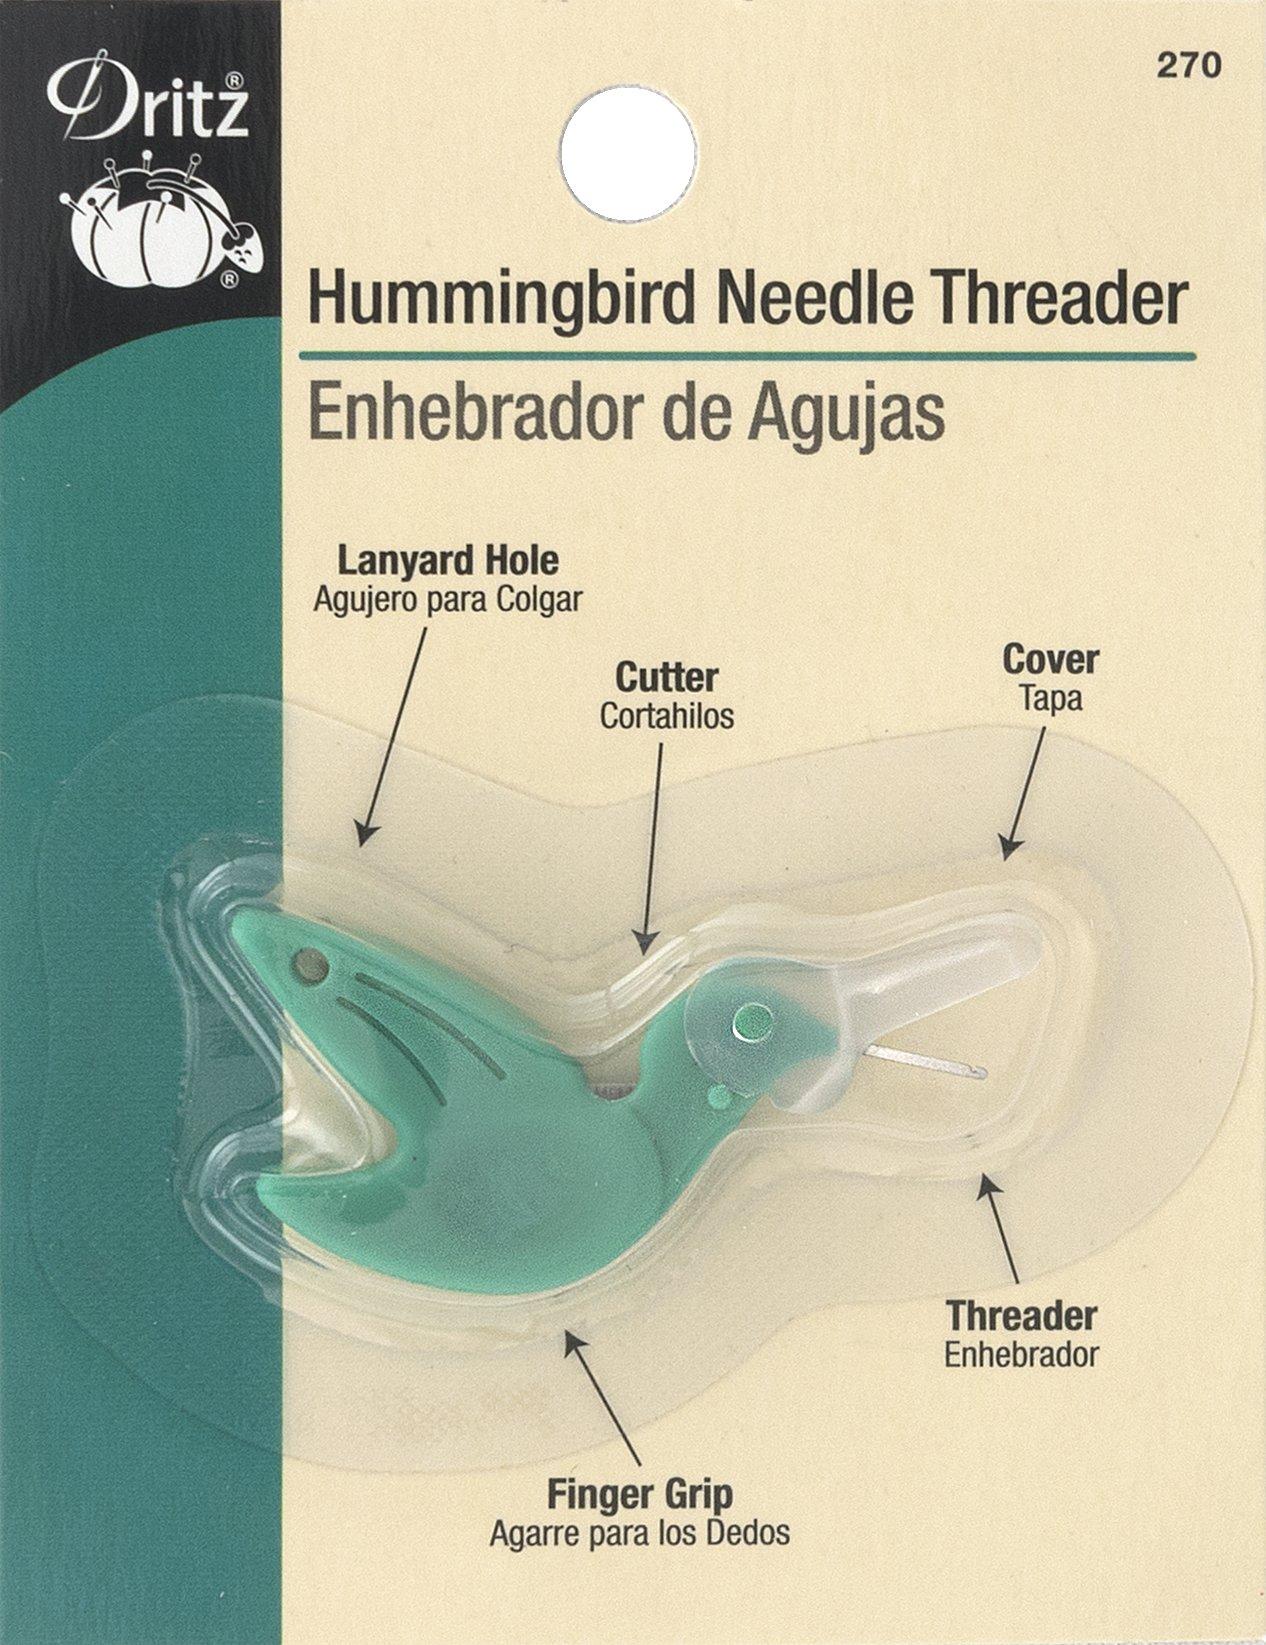 Dritz Hummingbird Needle Threader product image